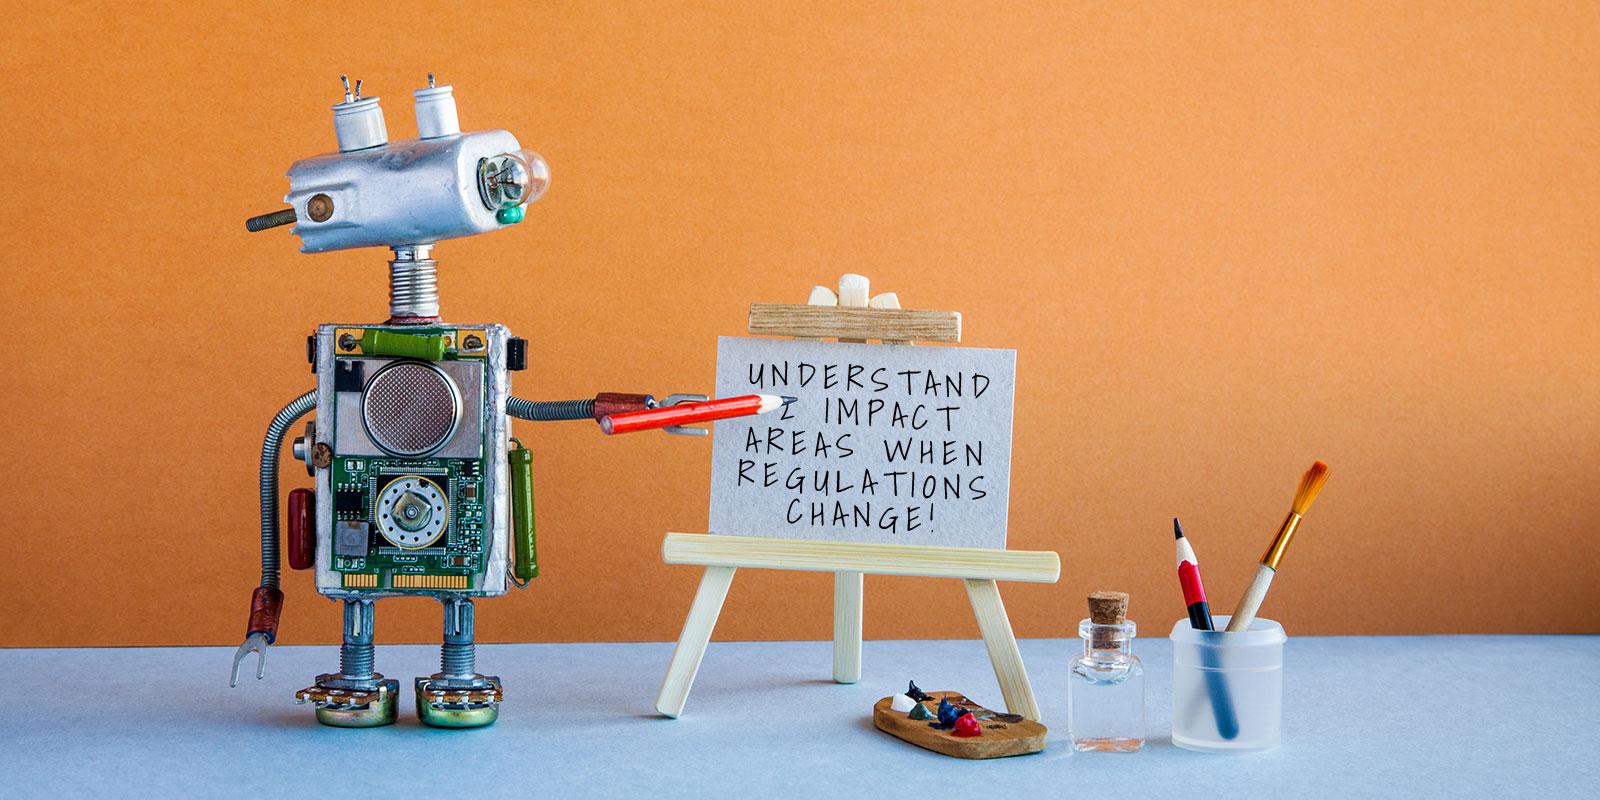 The regulatory innovation series, Part 1: Understand 2 impact areas when regulations change!